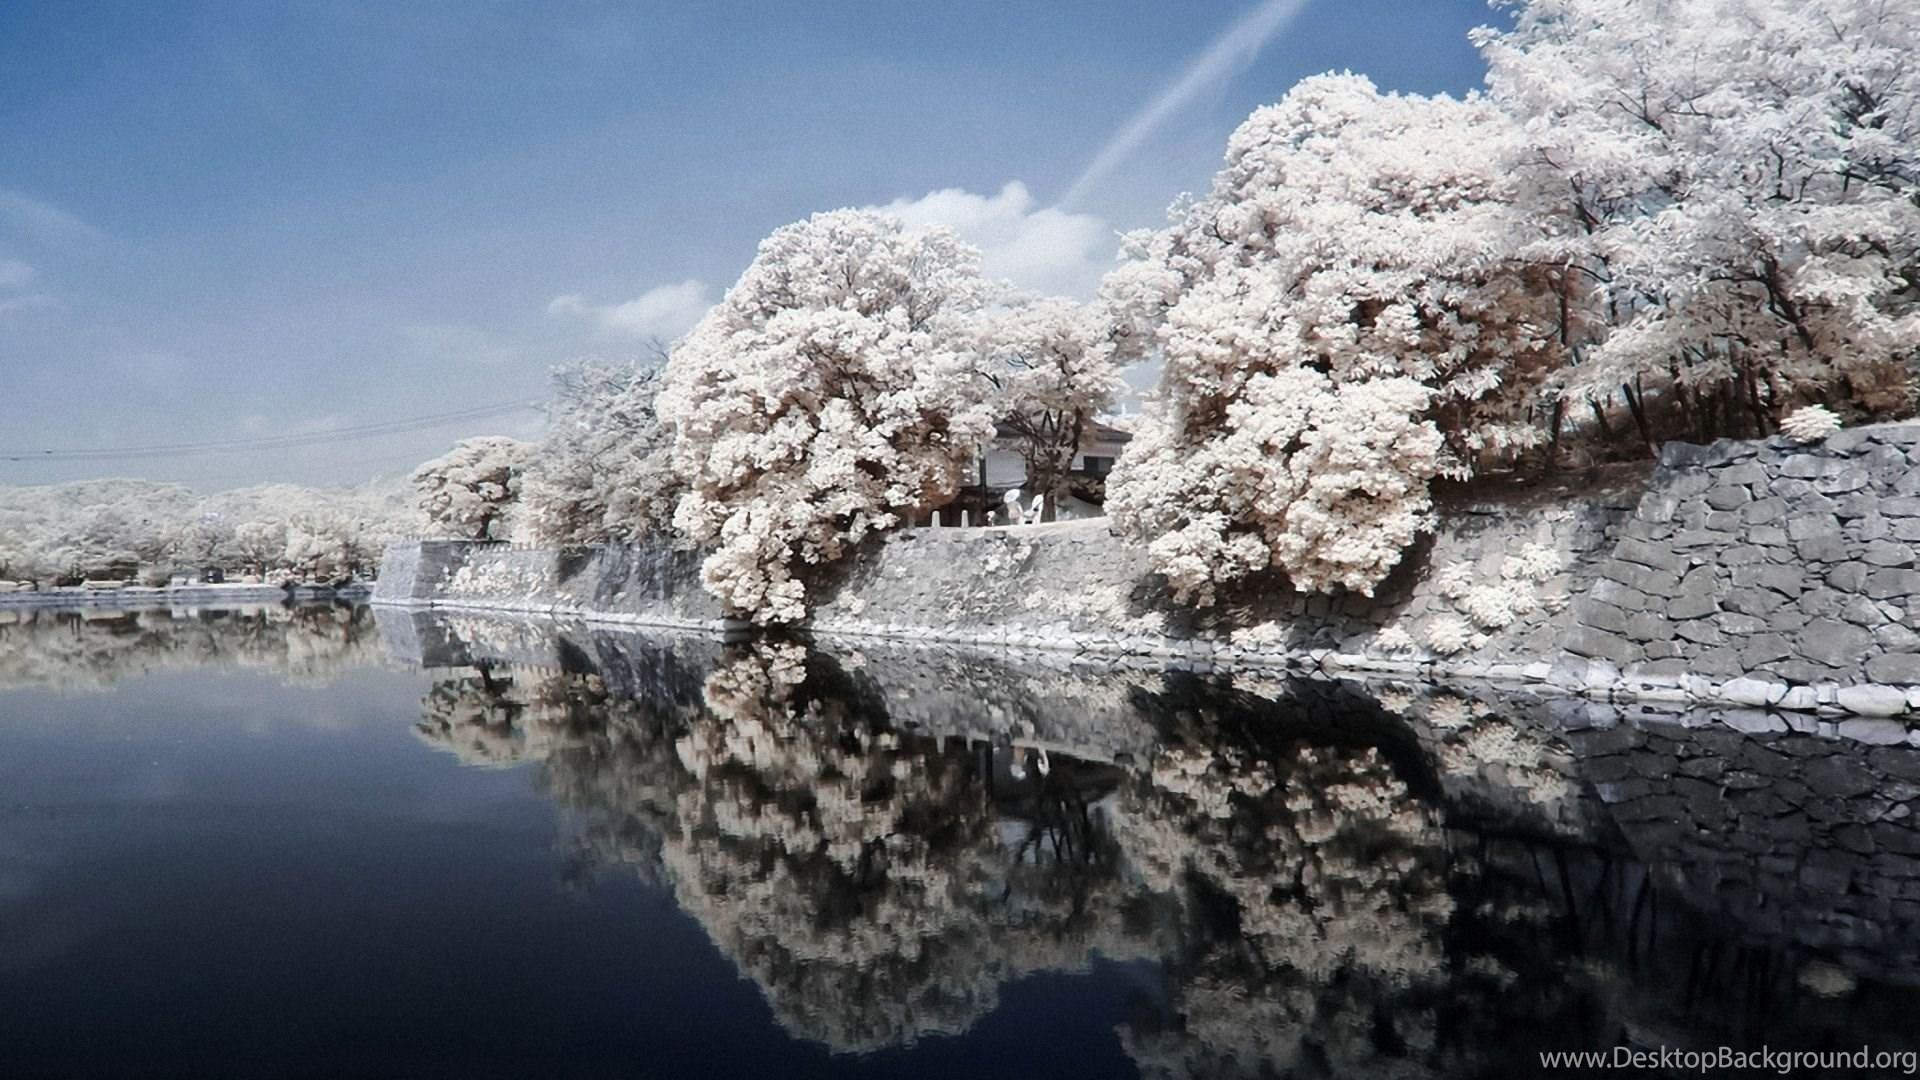 Hd Japan Wallpapers 1080p: Full HD 1080p Japan Wallpapers HD, Desktop Backgrounds